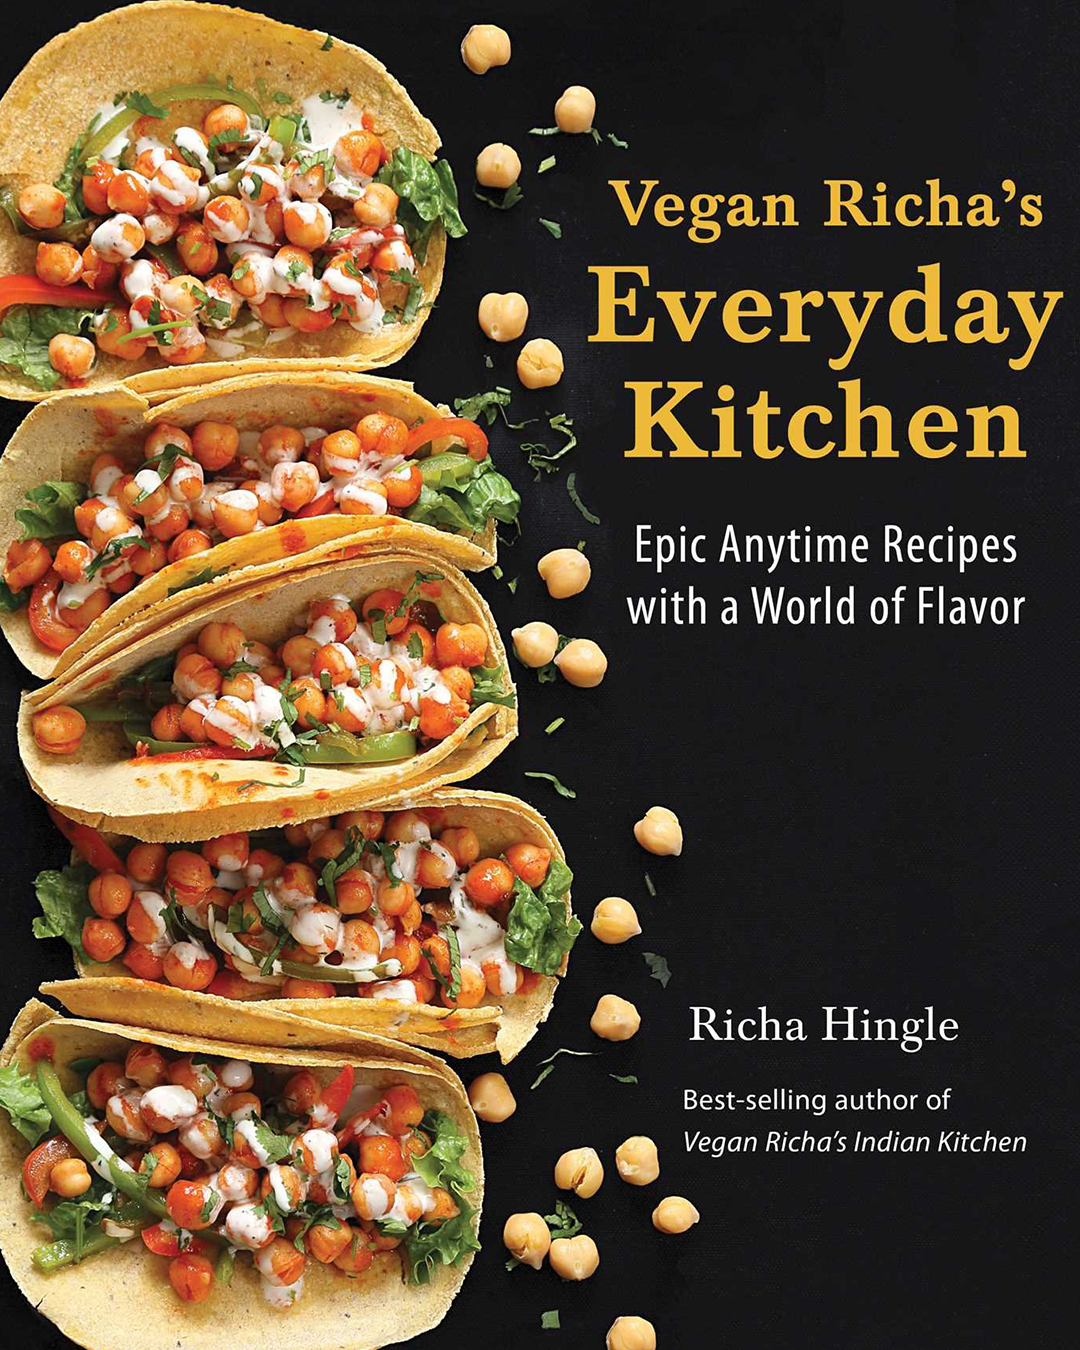 Vegan Richa Cookbook Cover